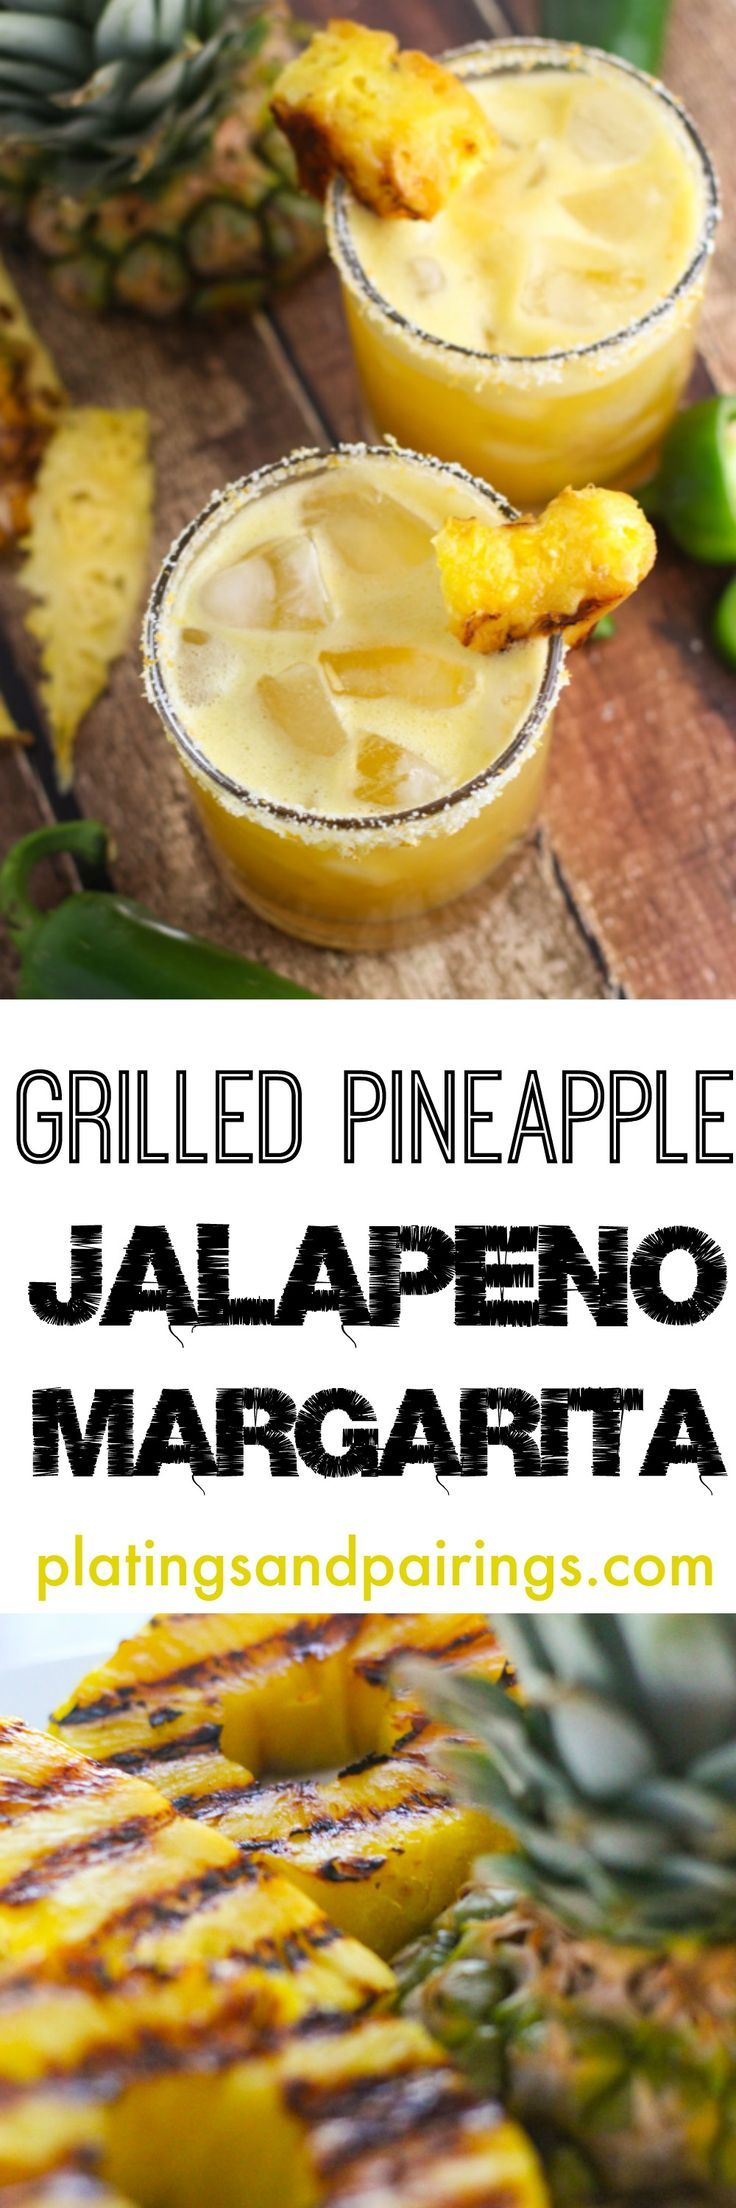 Grilled Pineapple Jalapeño Margarita